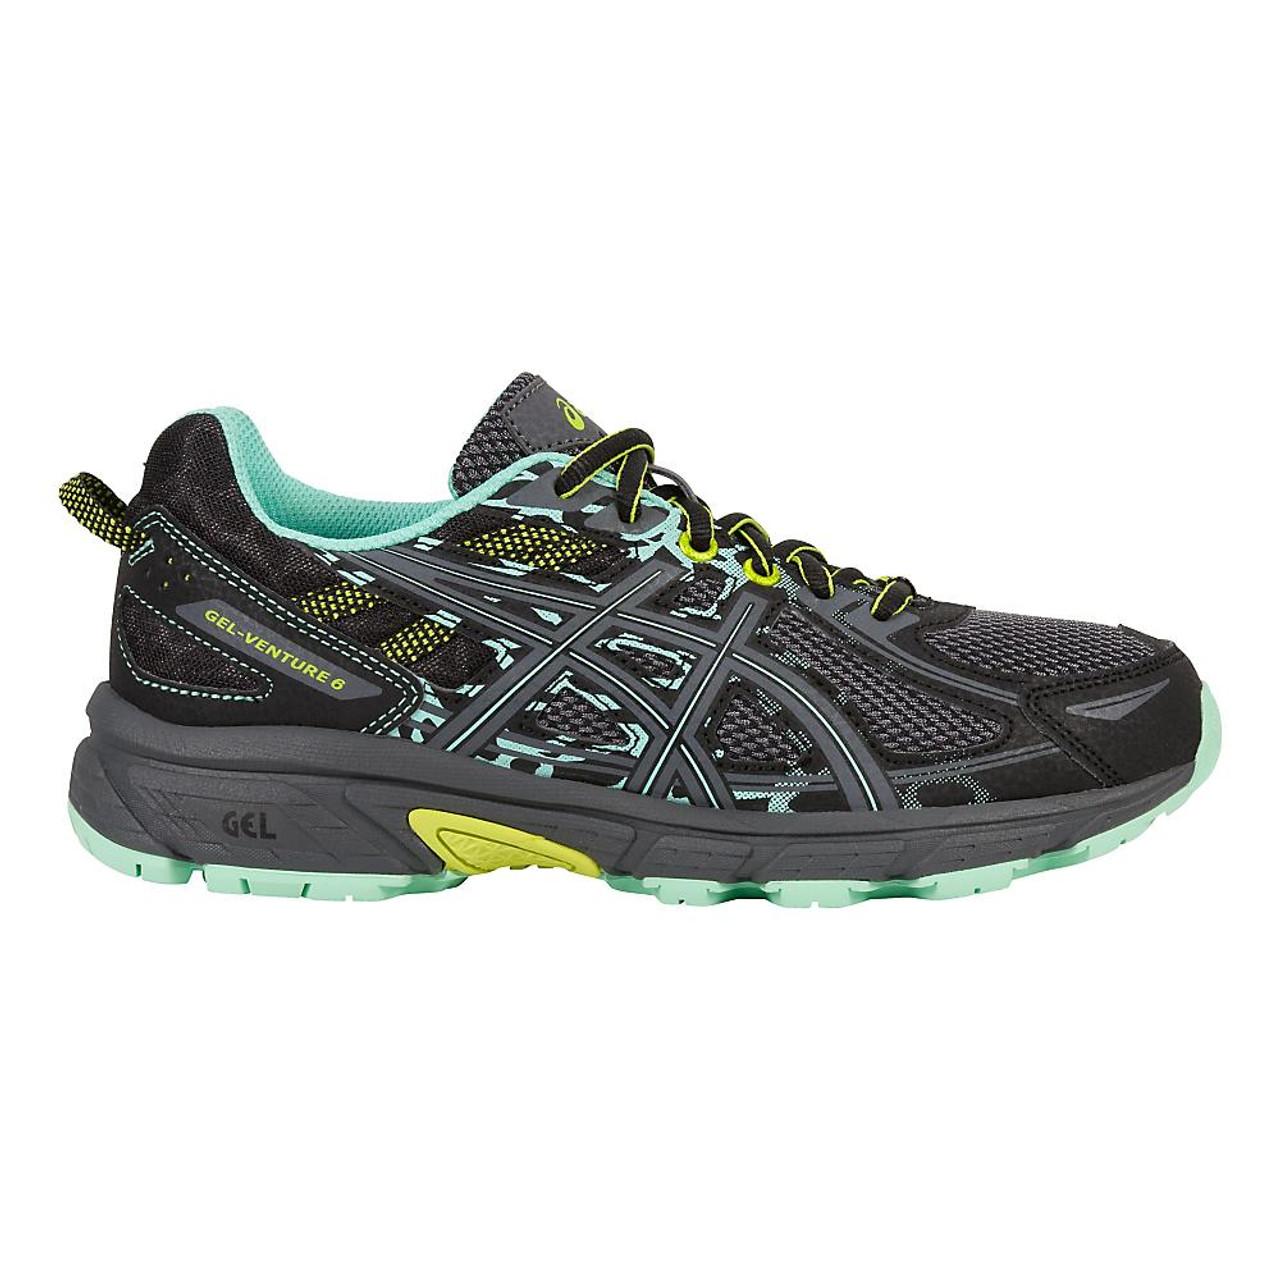 Women's ASICS GEL-Venture 6 Trail Shoes